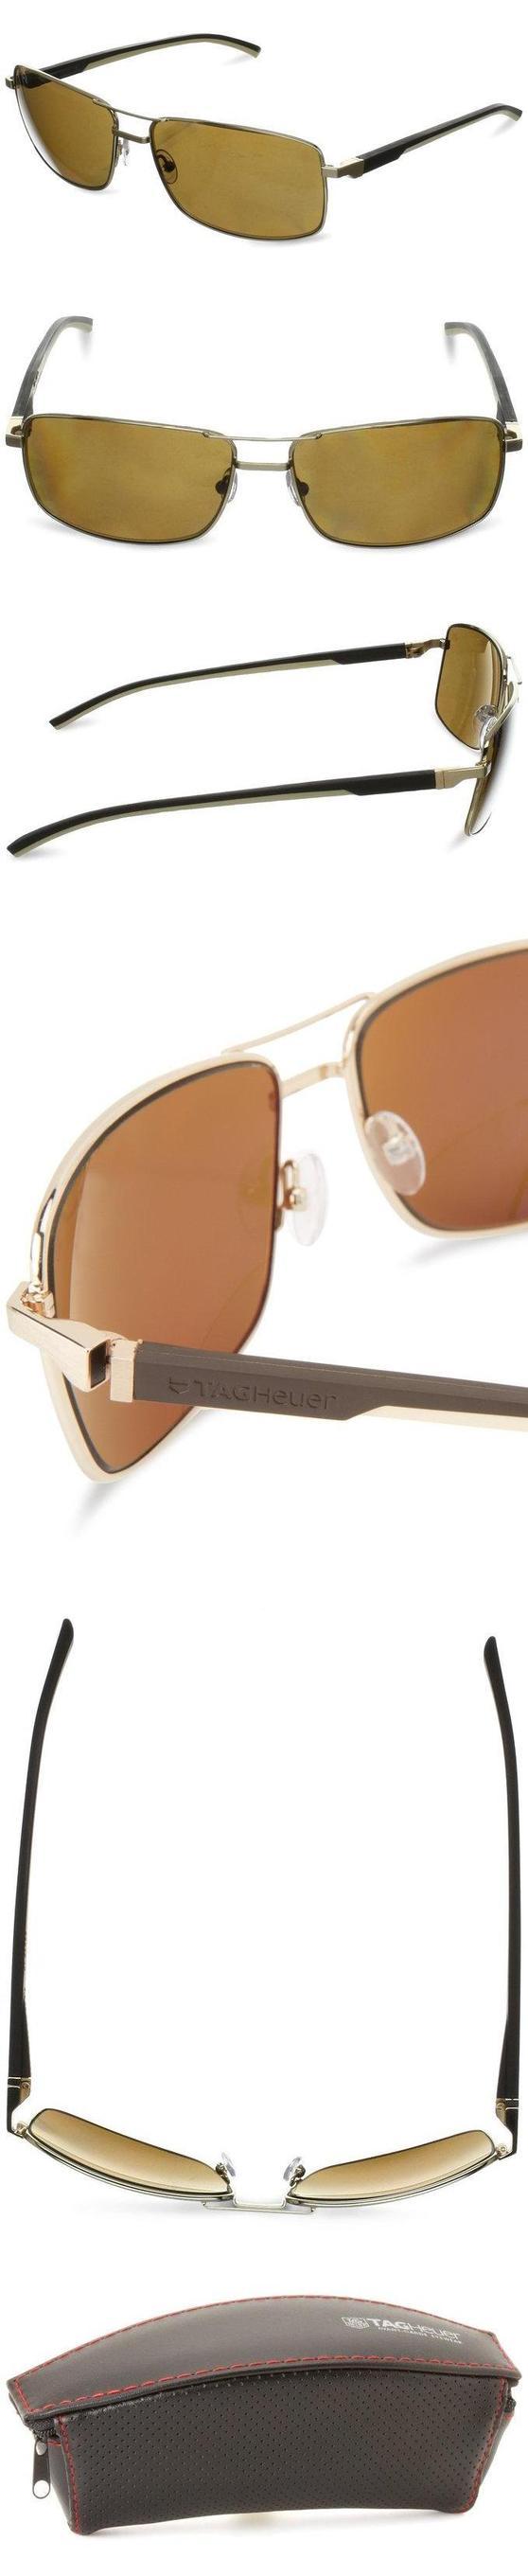 $515 - Tag Heuer Automatic 883 214 Polarized Rectangular Sunglasses,Gold,62 mm #apparel #eyewear #tagheuer #sunglasses #shops #women #departments #men